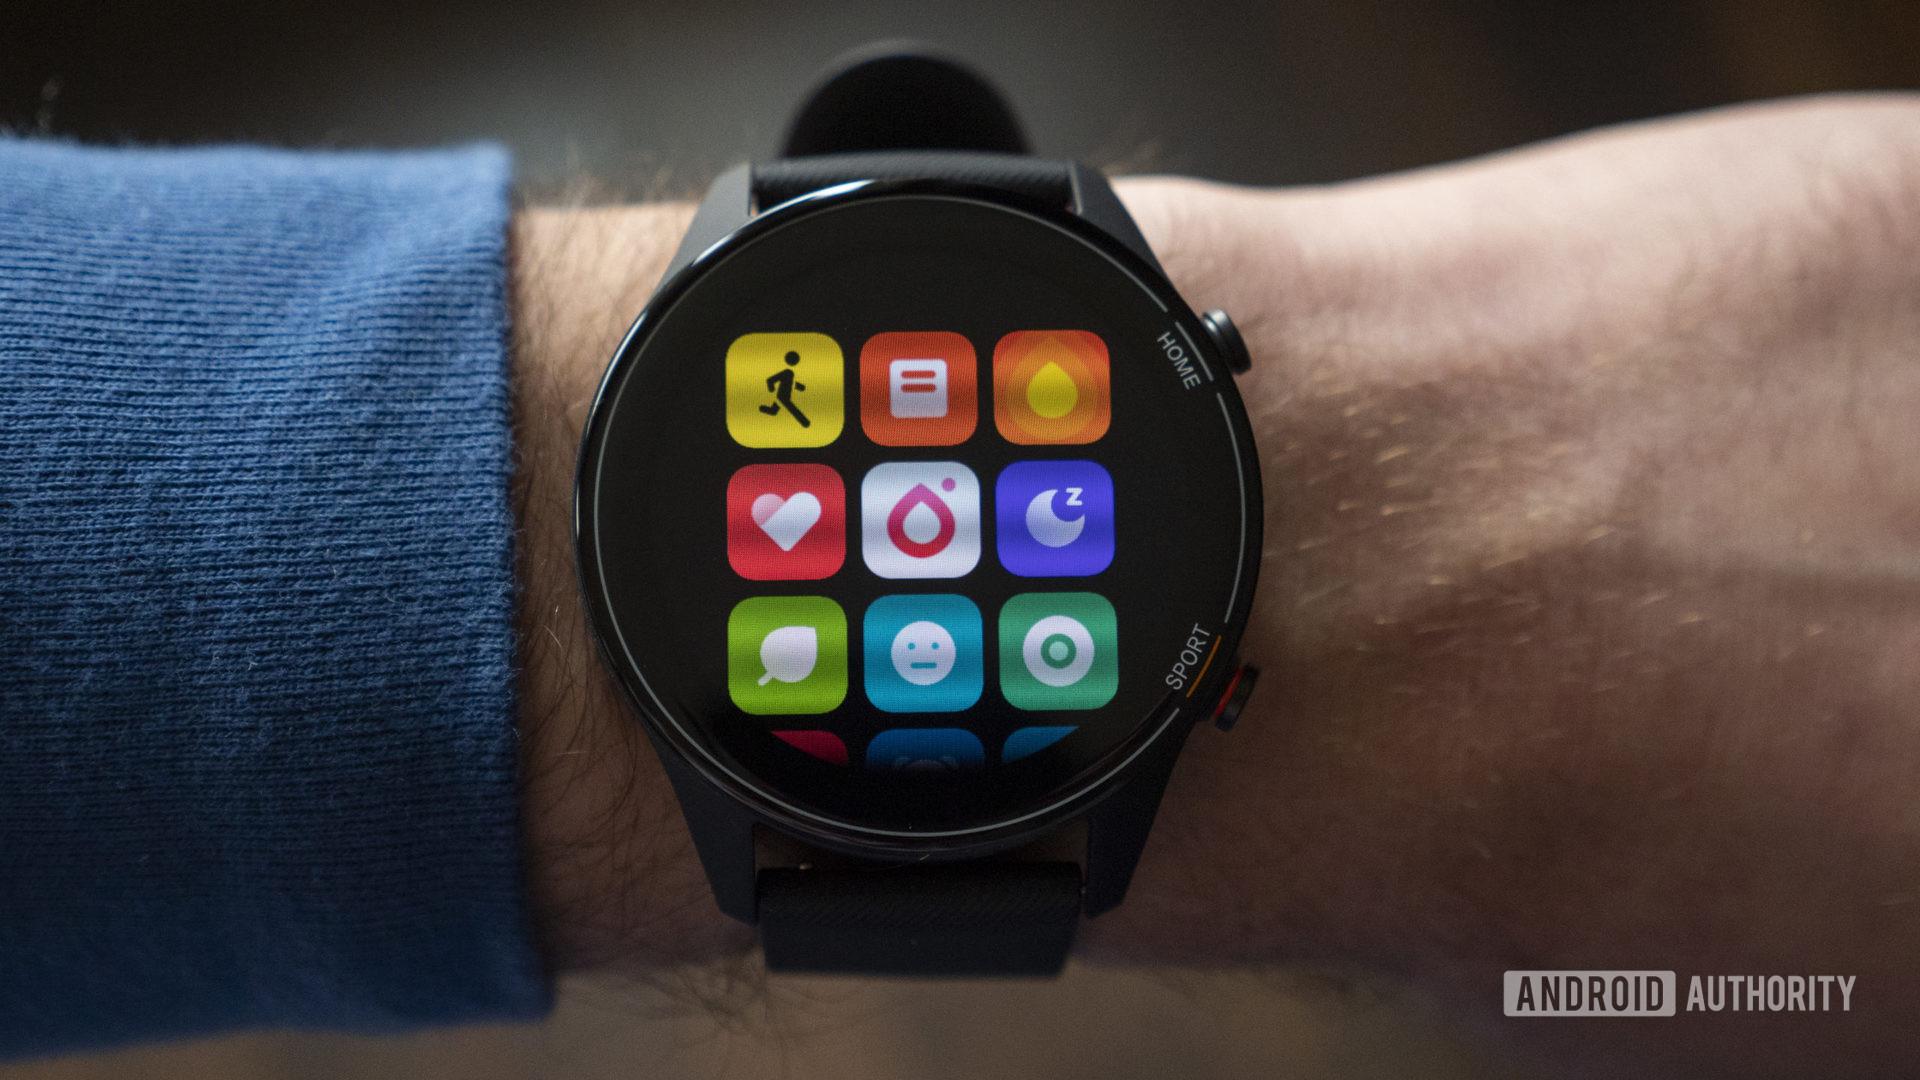 xiaomi mi watch review all apps screen